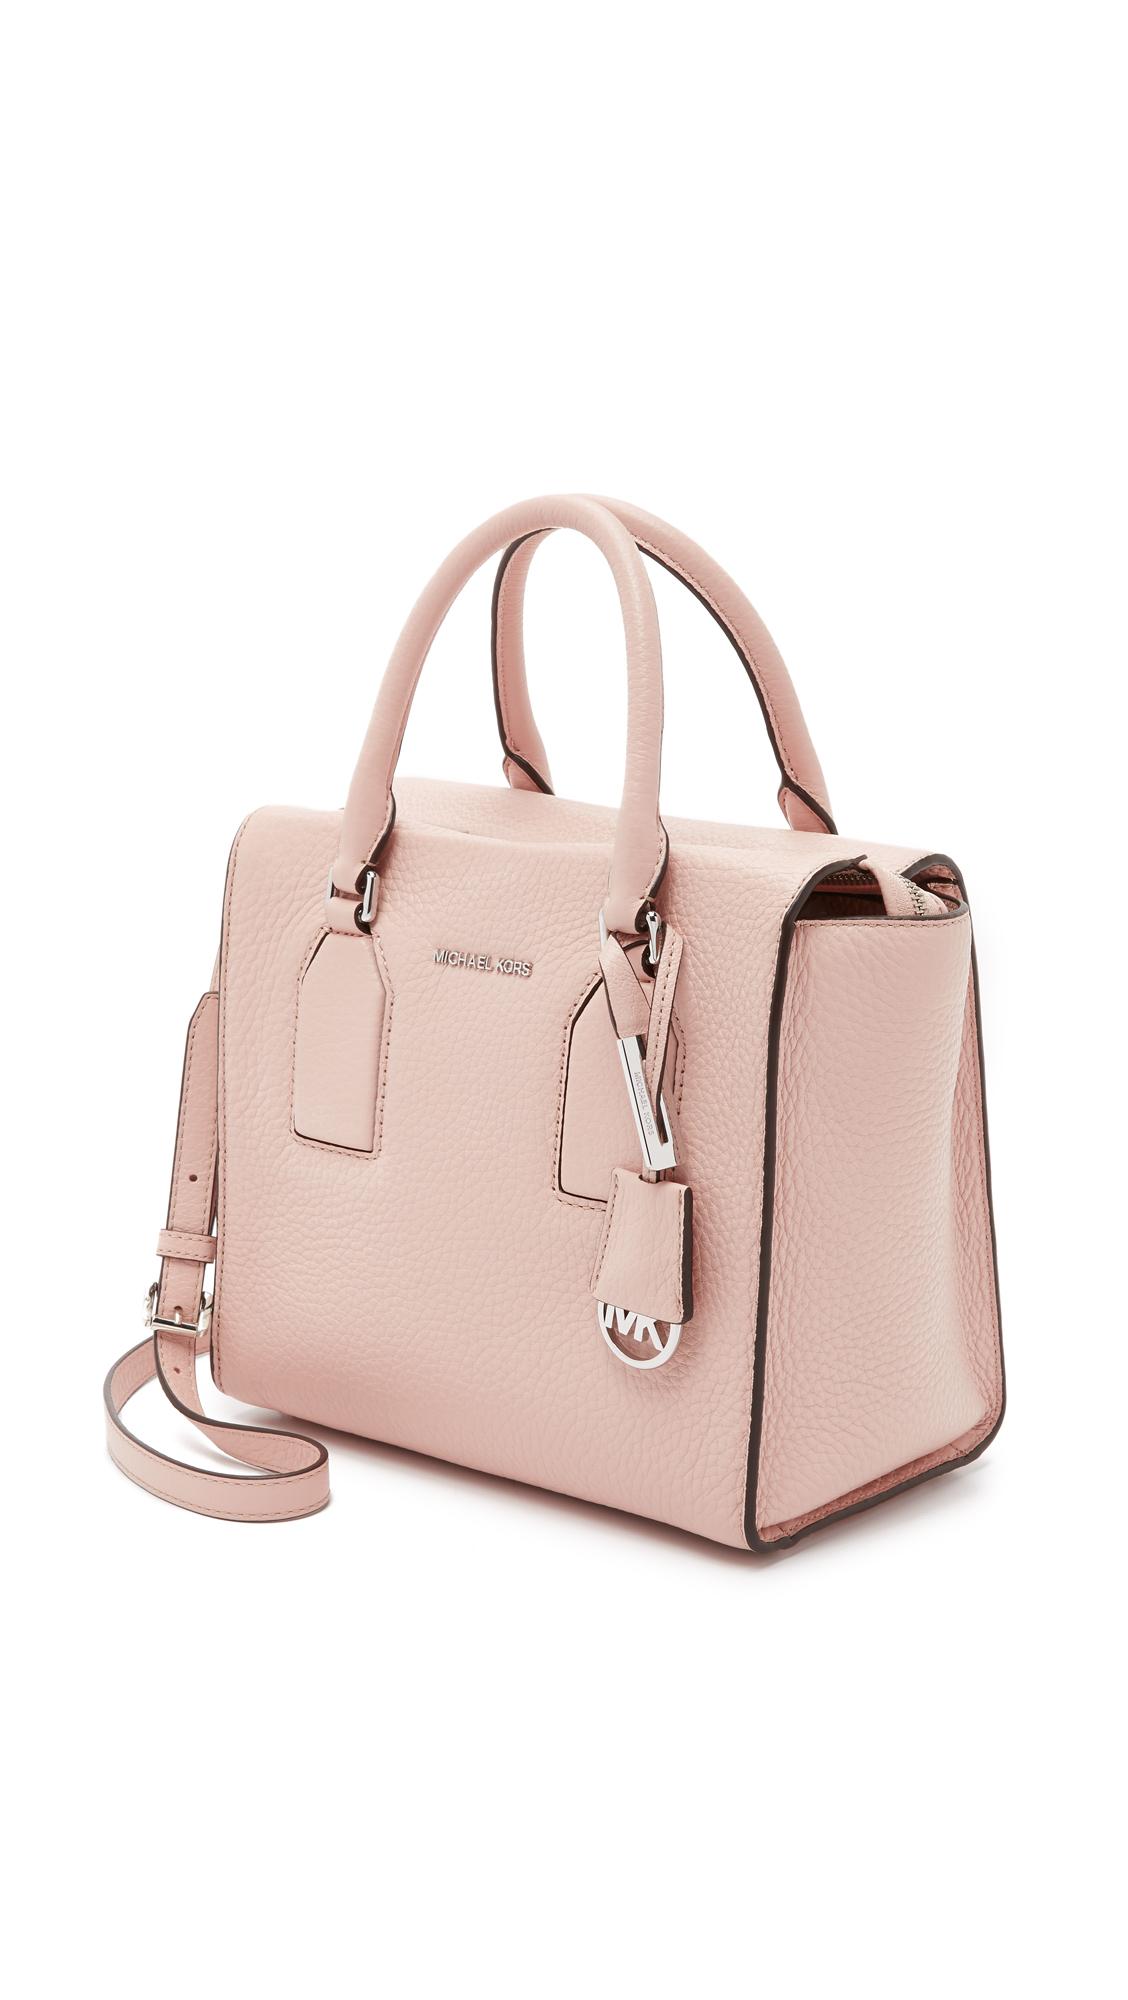 ... order lyst michael michael kors selby medium satchel in pink 28bbc da9eb 23f95f2df4682